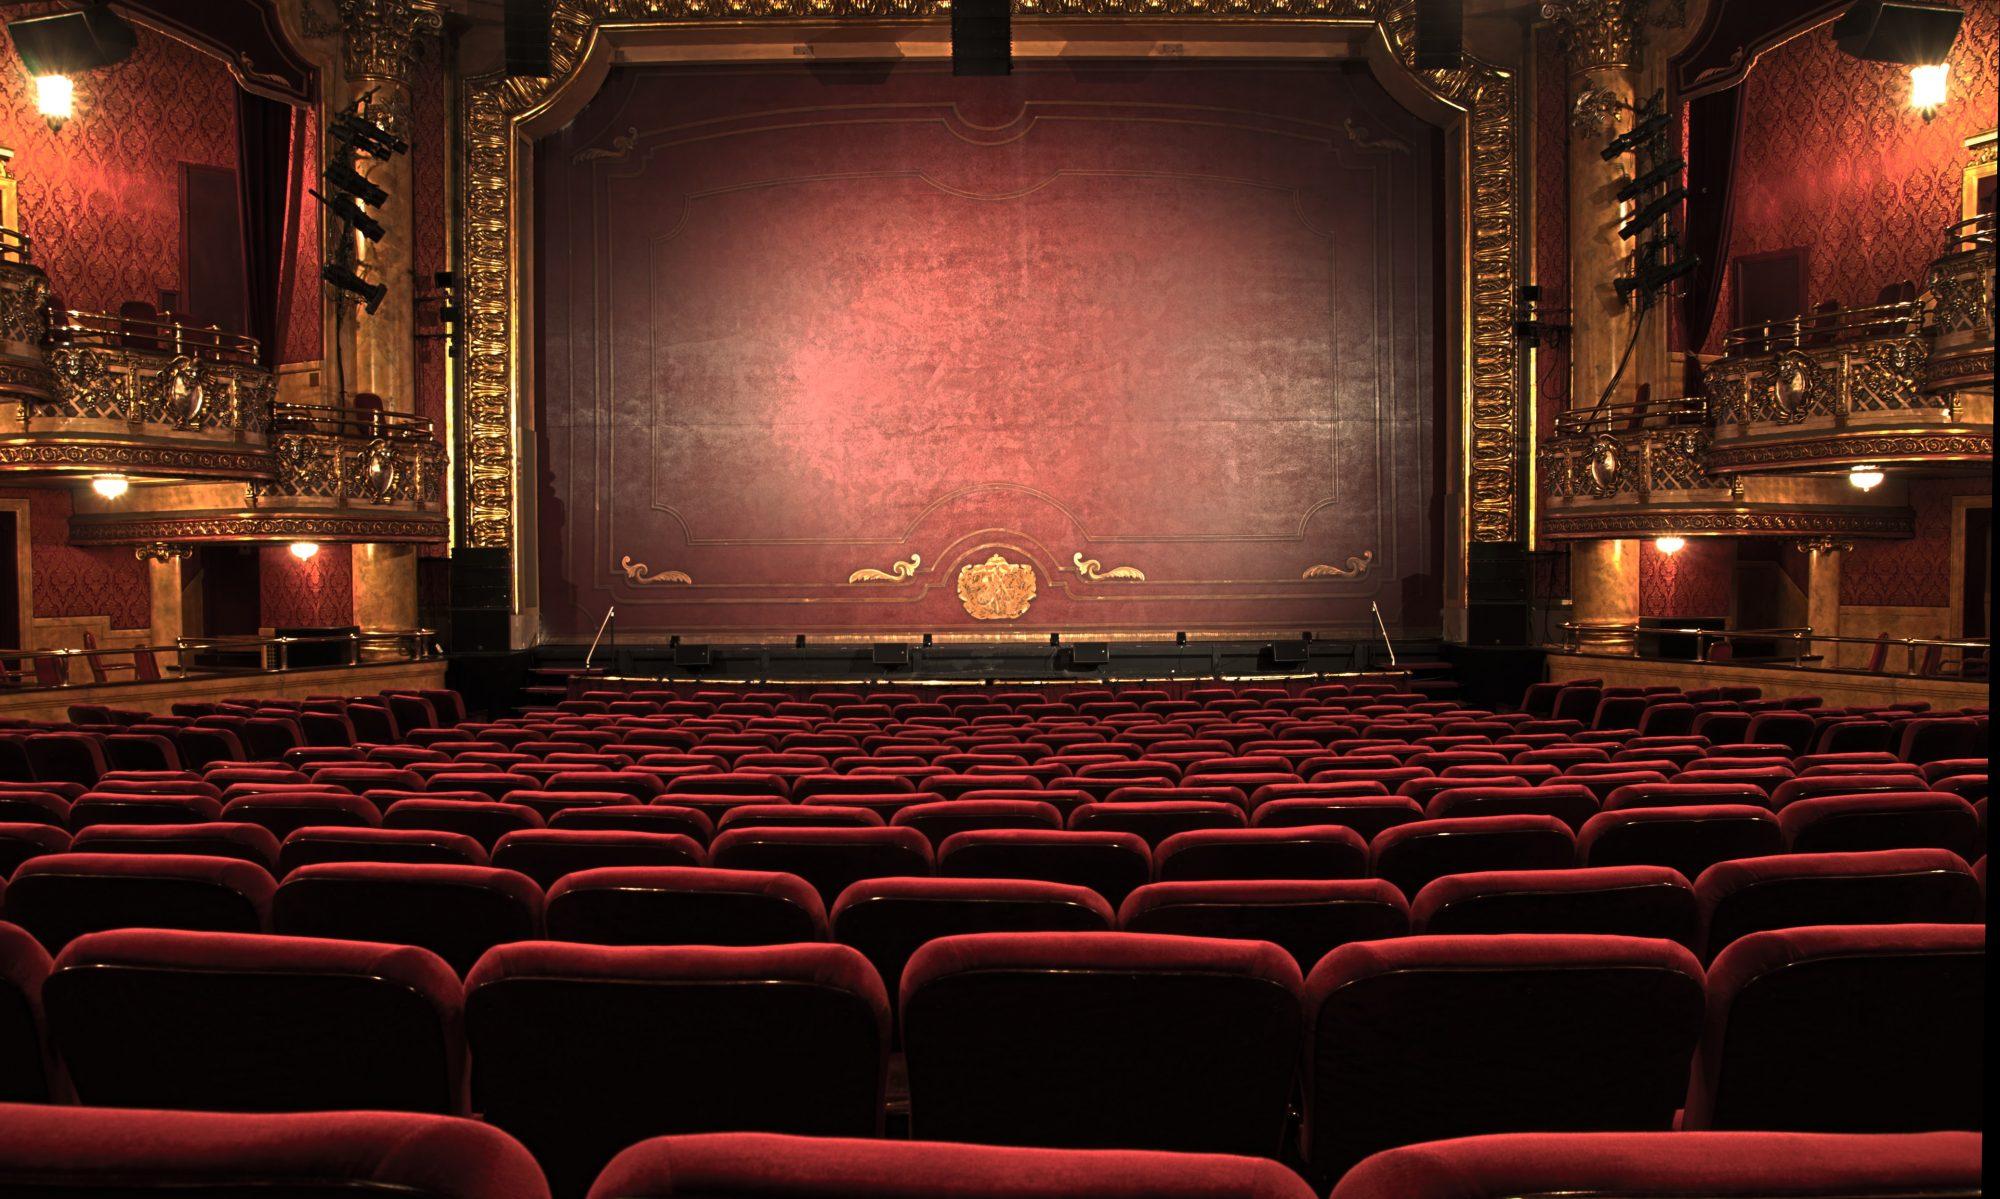 Haardter Balkontheater